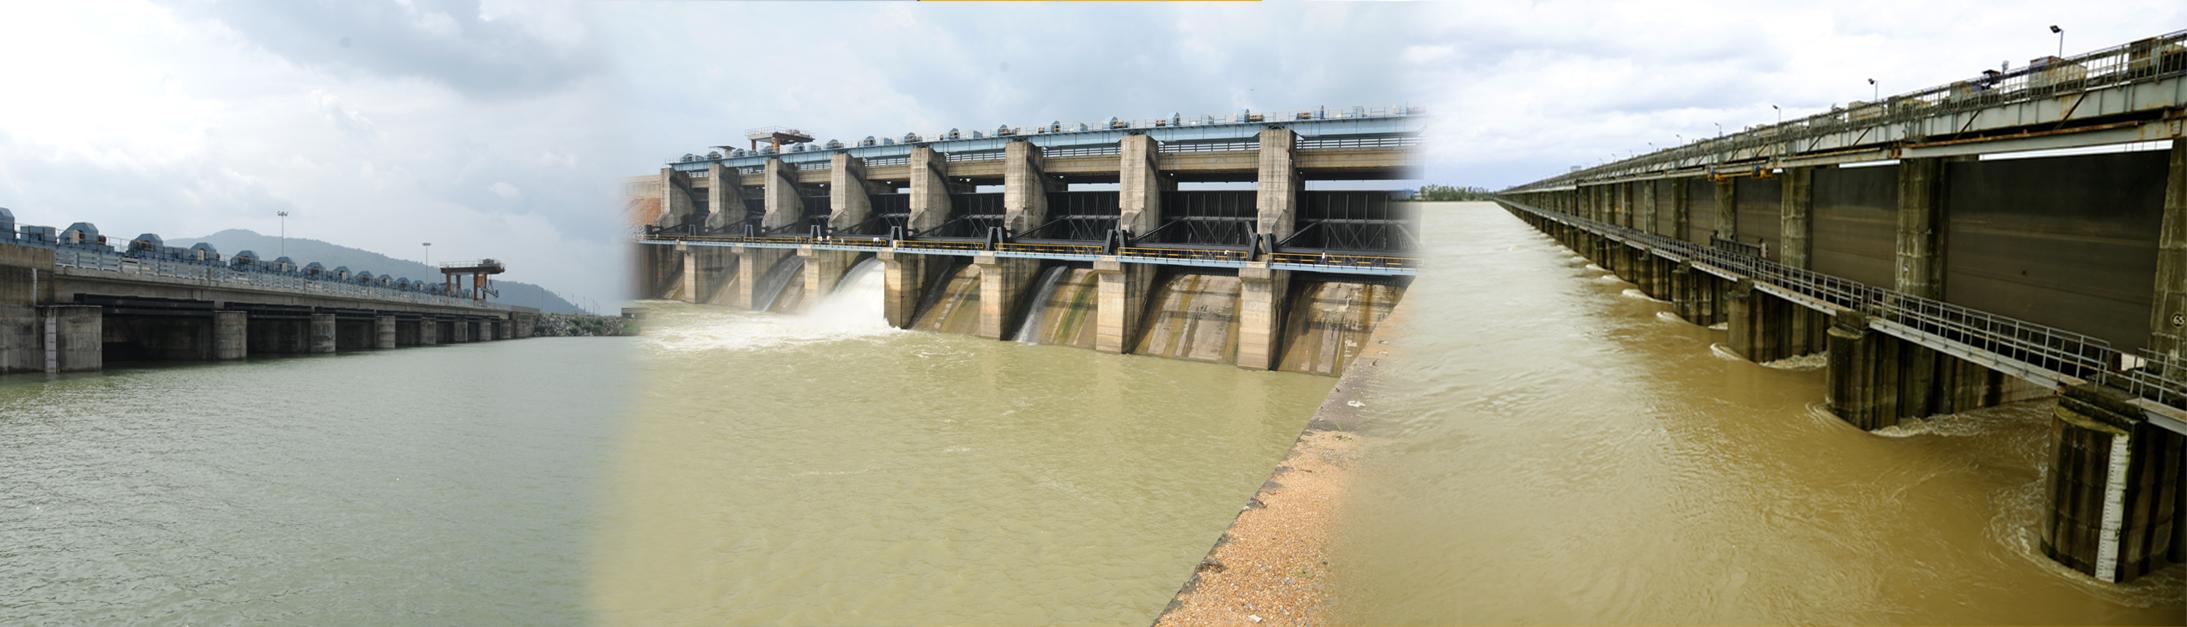 Kelo Dam, Raigarh